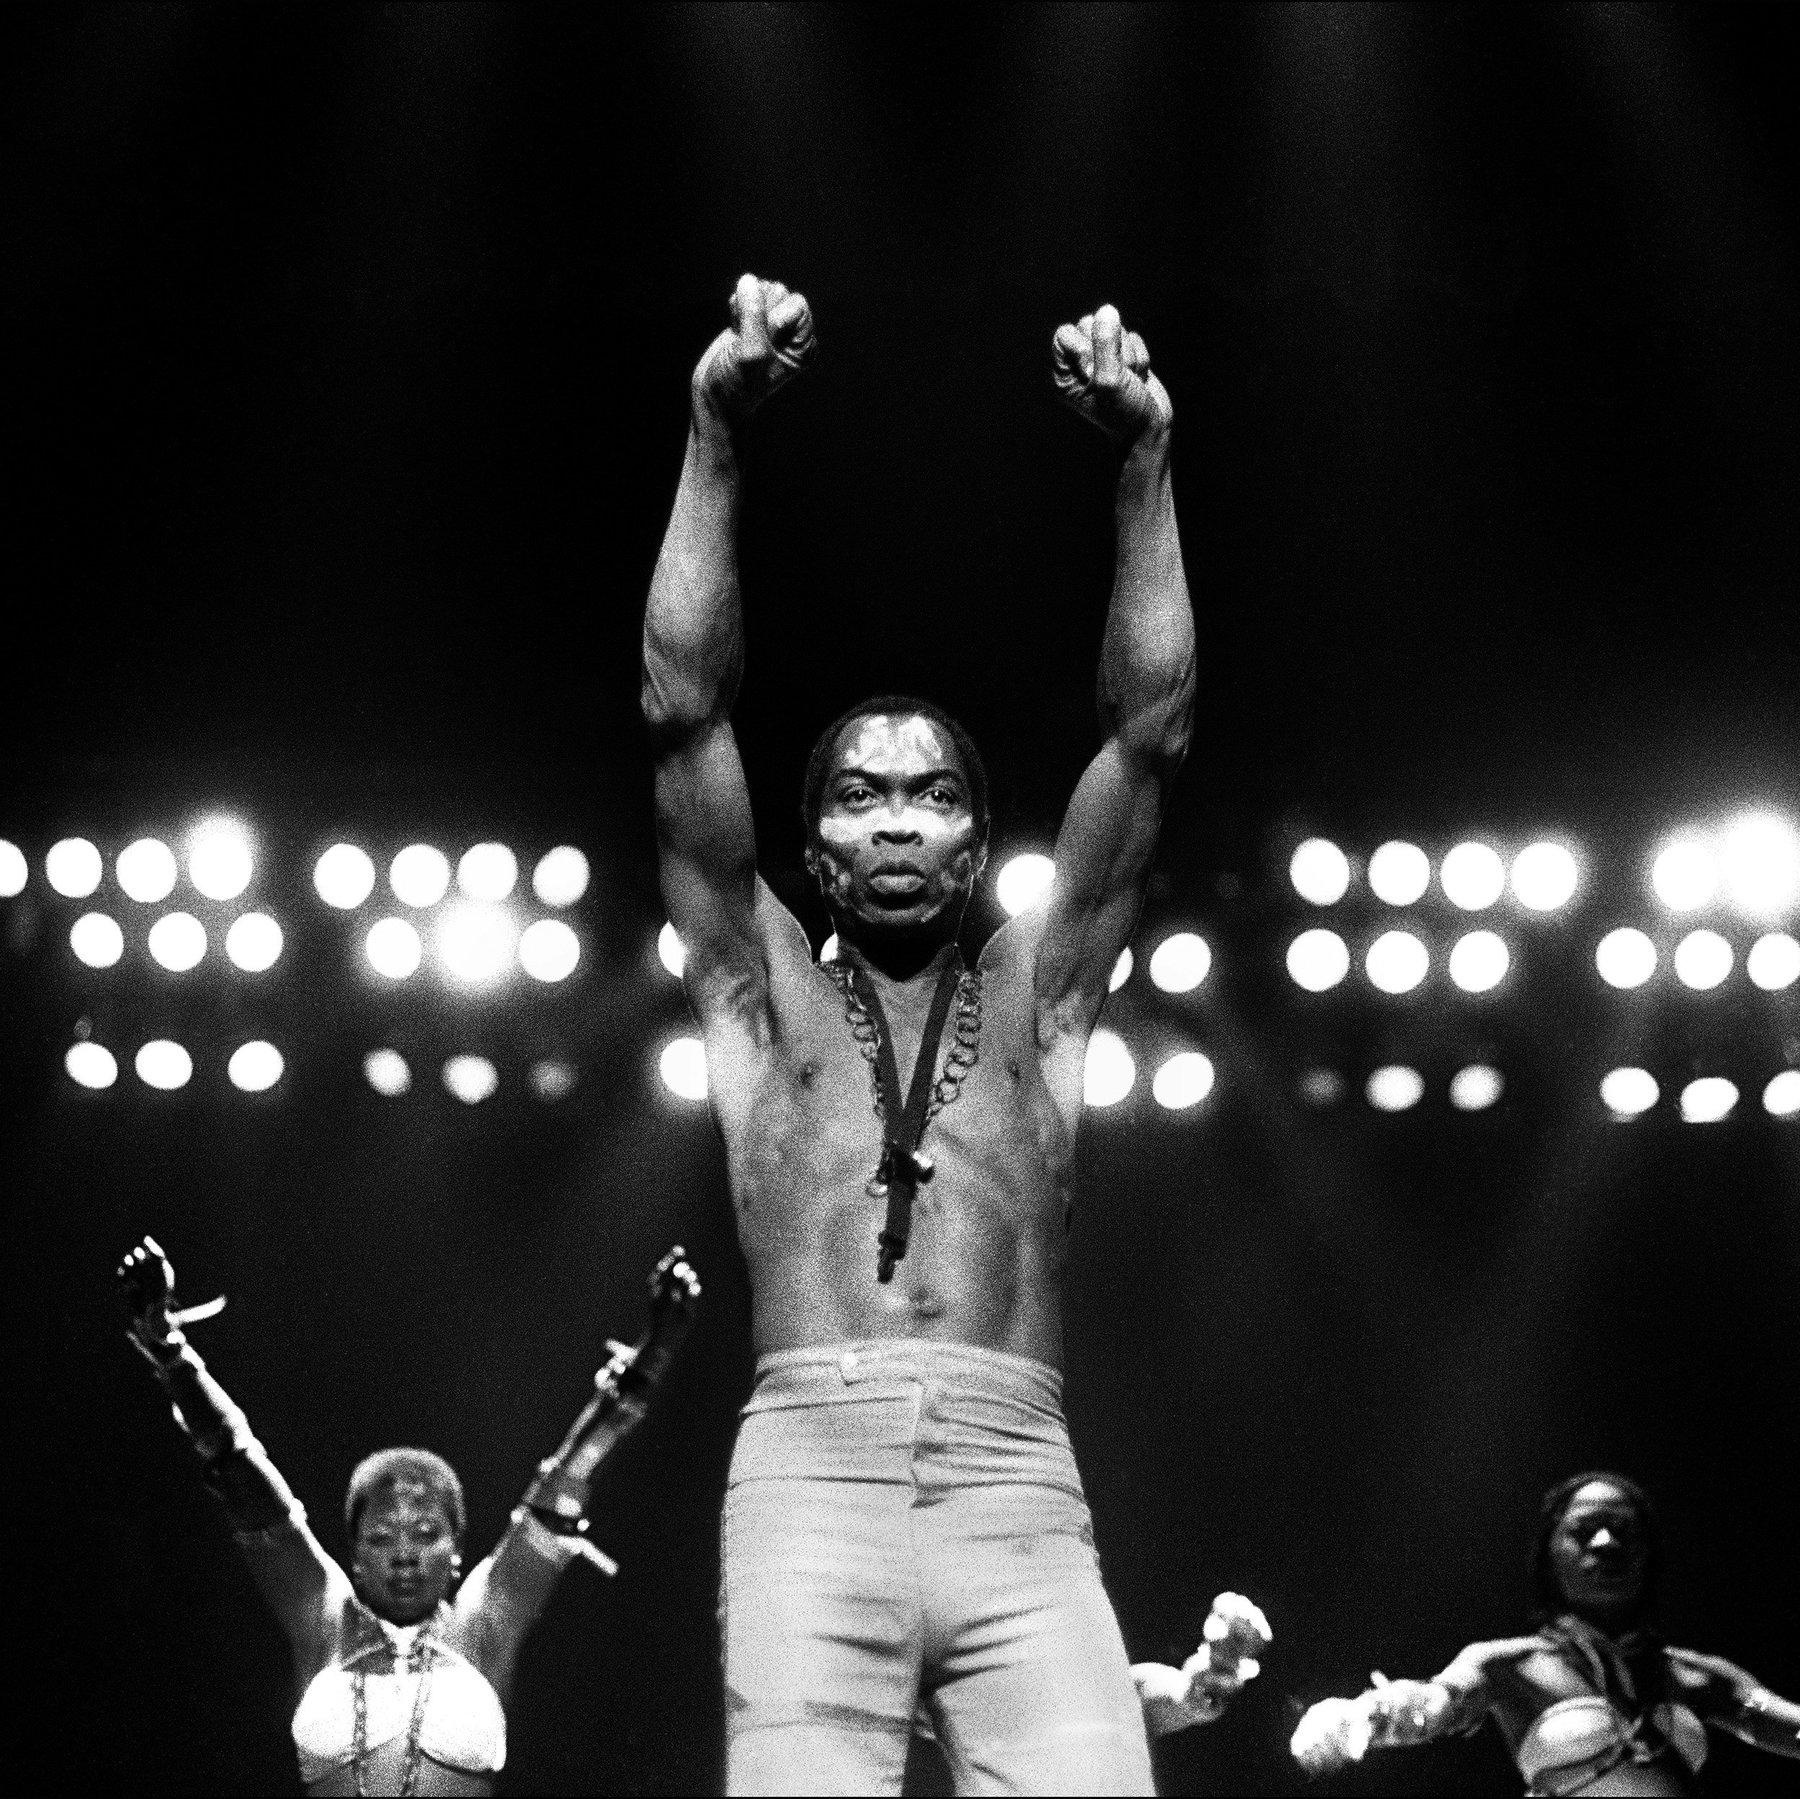 EFEMÉRIDE MUSICAL - Fela Kuti